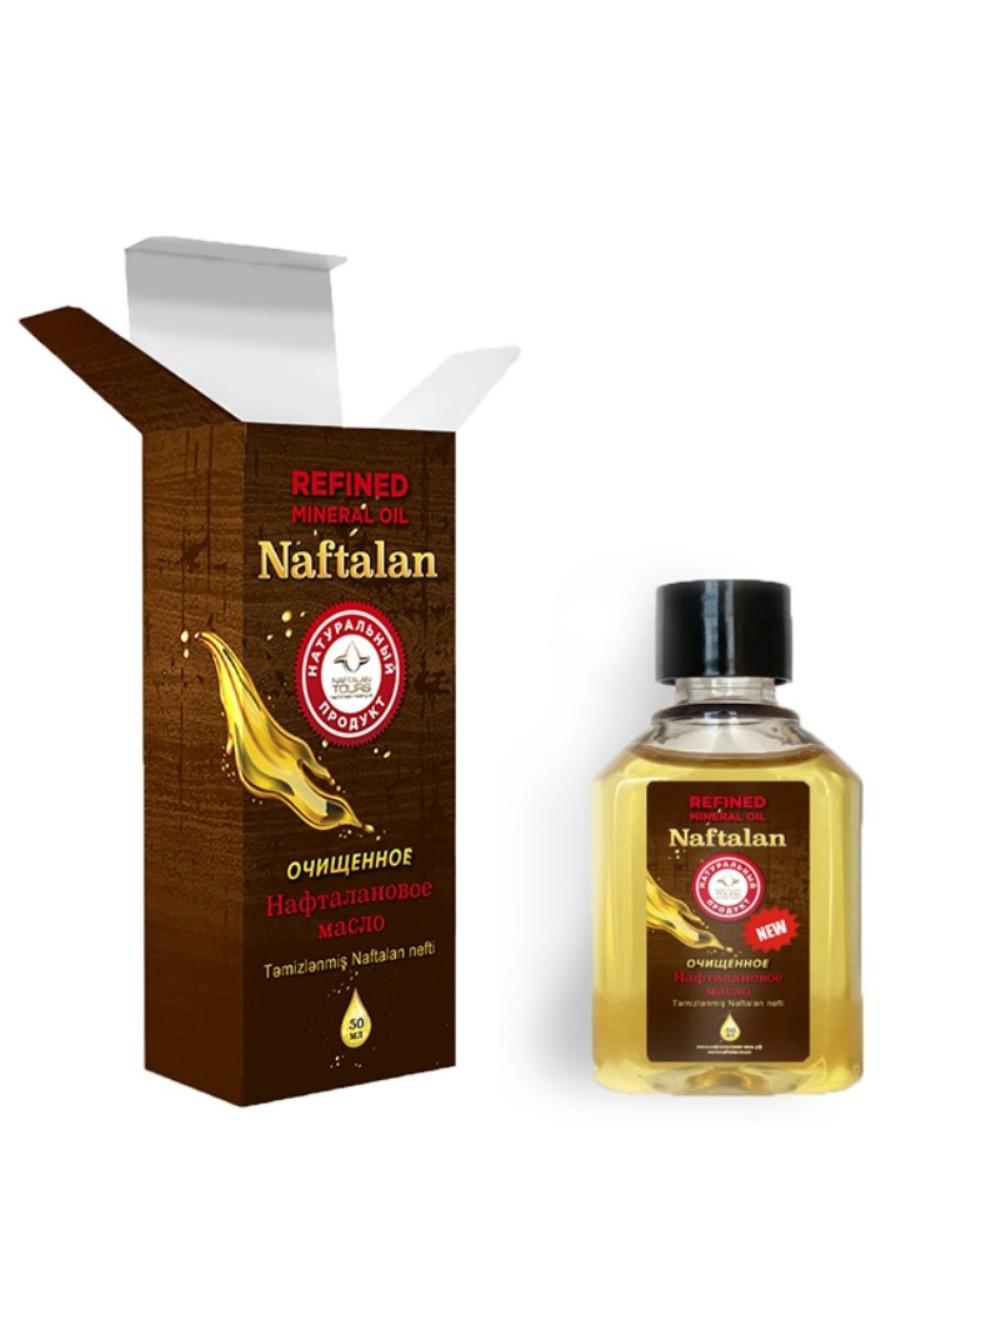 Нафталан масло оптом